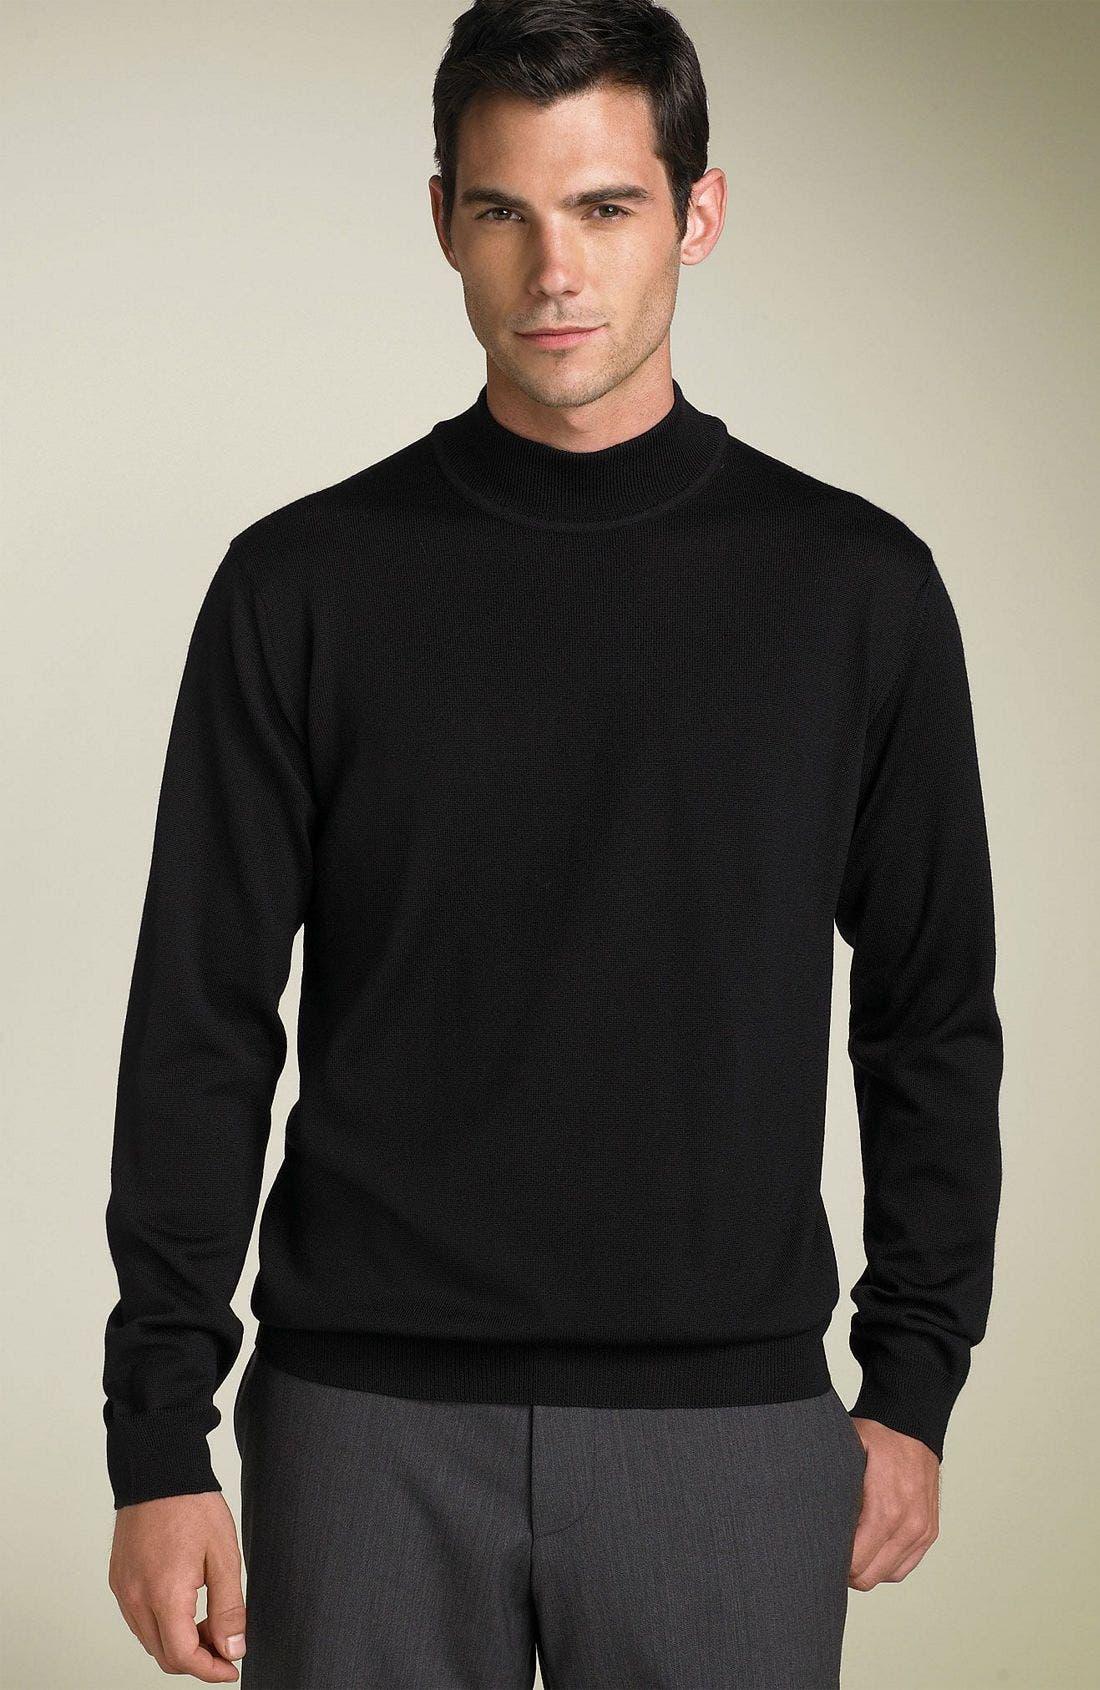 Merino Wool Mock Turtleneck Sweater,                             Main thumbnail 1, color,                             001